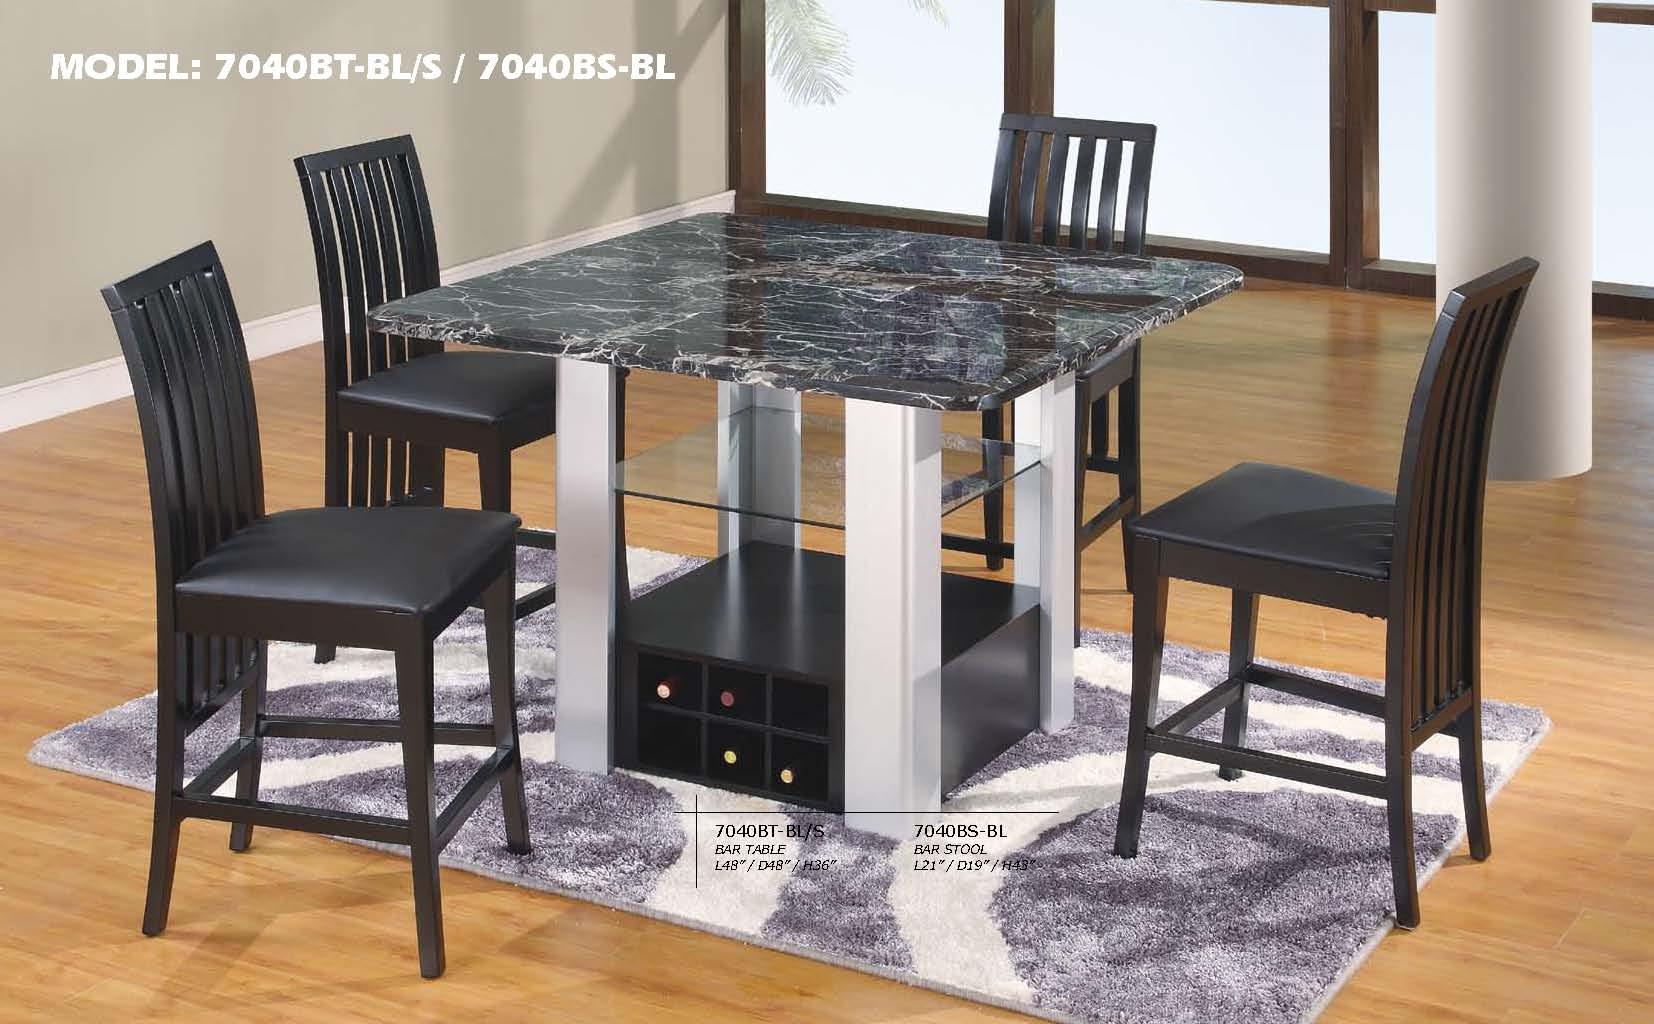 Black And Silver Furniture 24 Widescreen Wallpaper